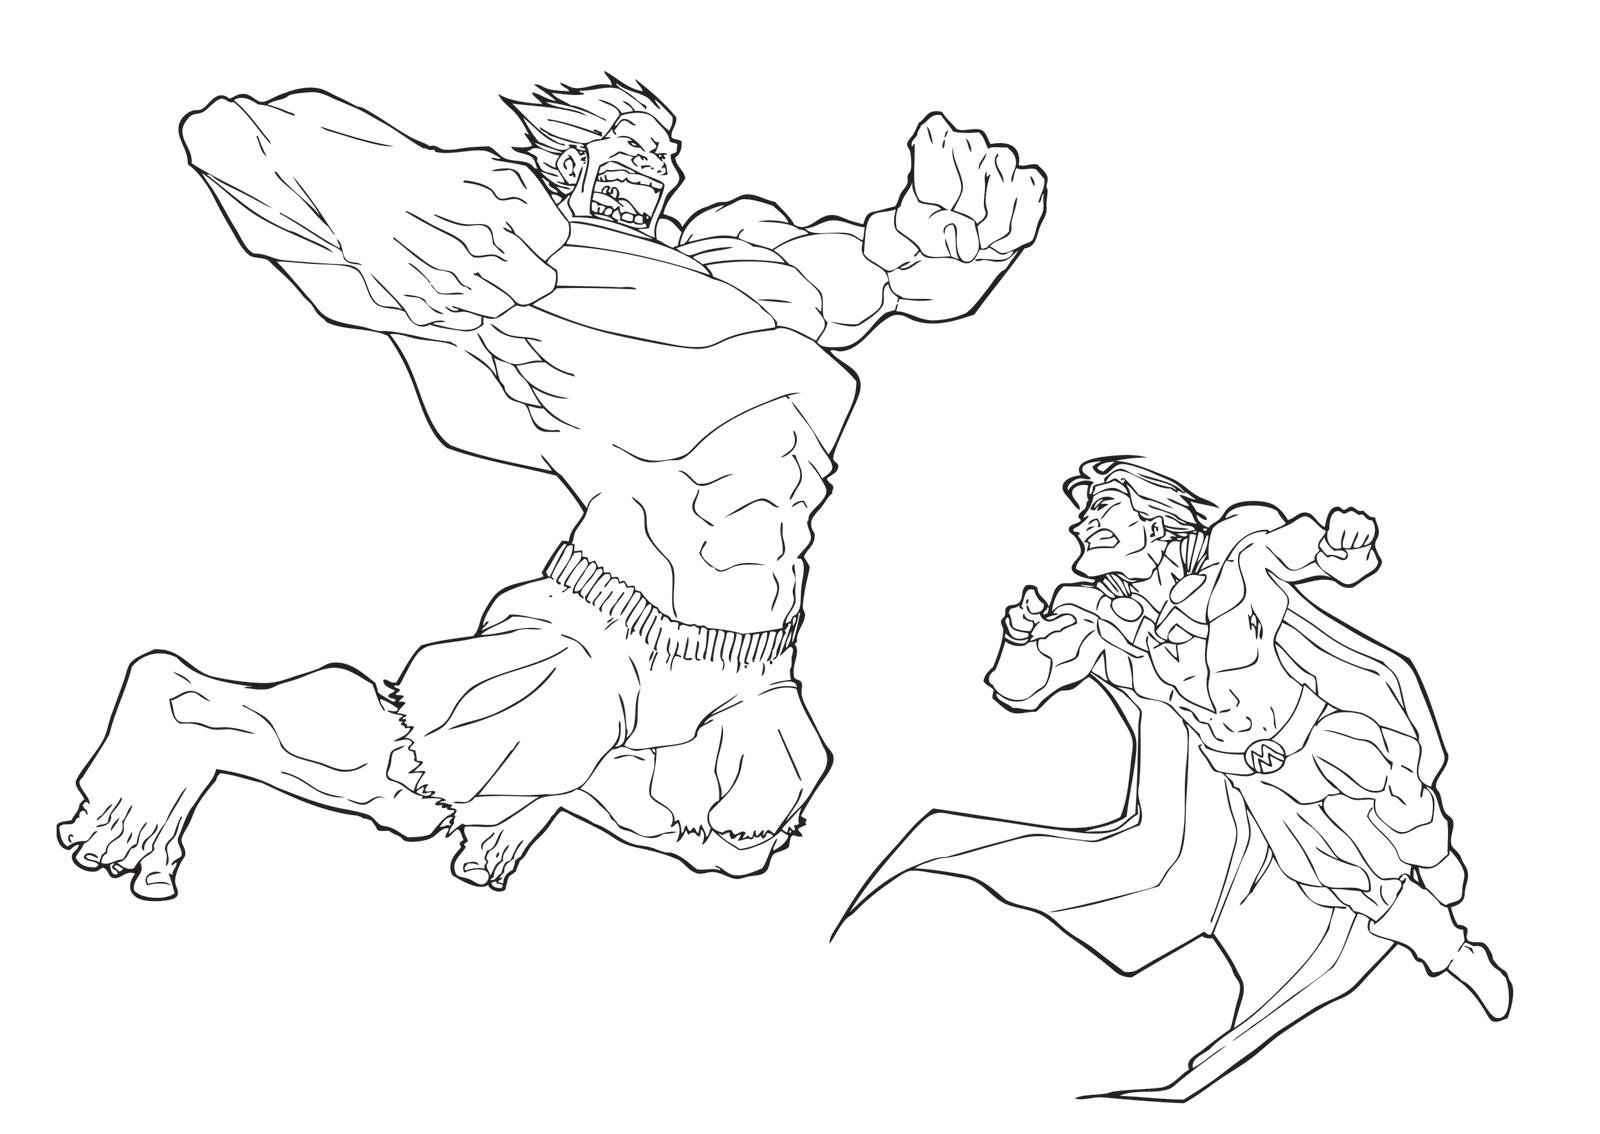 hulk vs superman coloring pages - photo#35